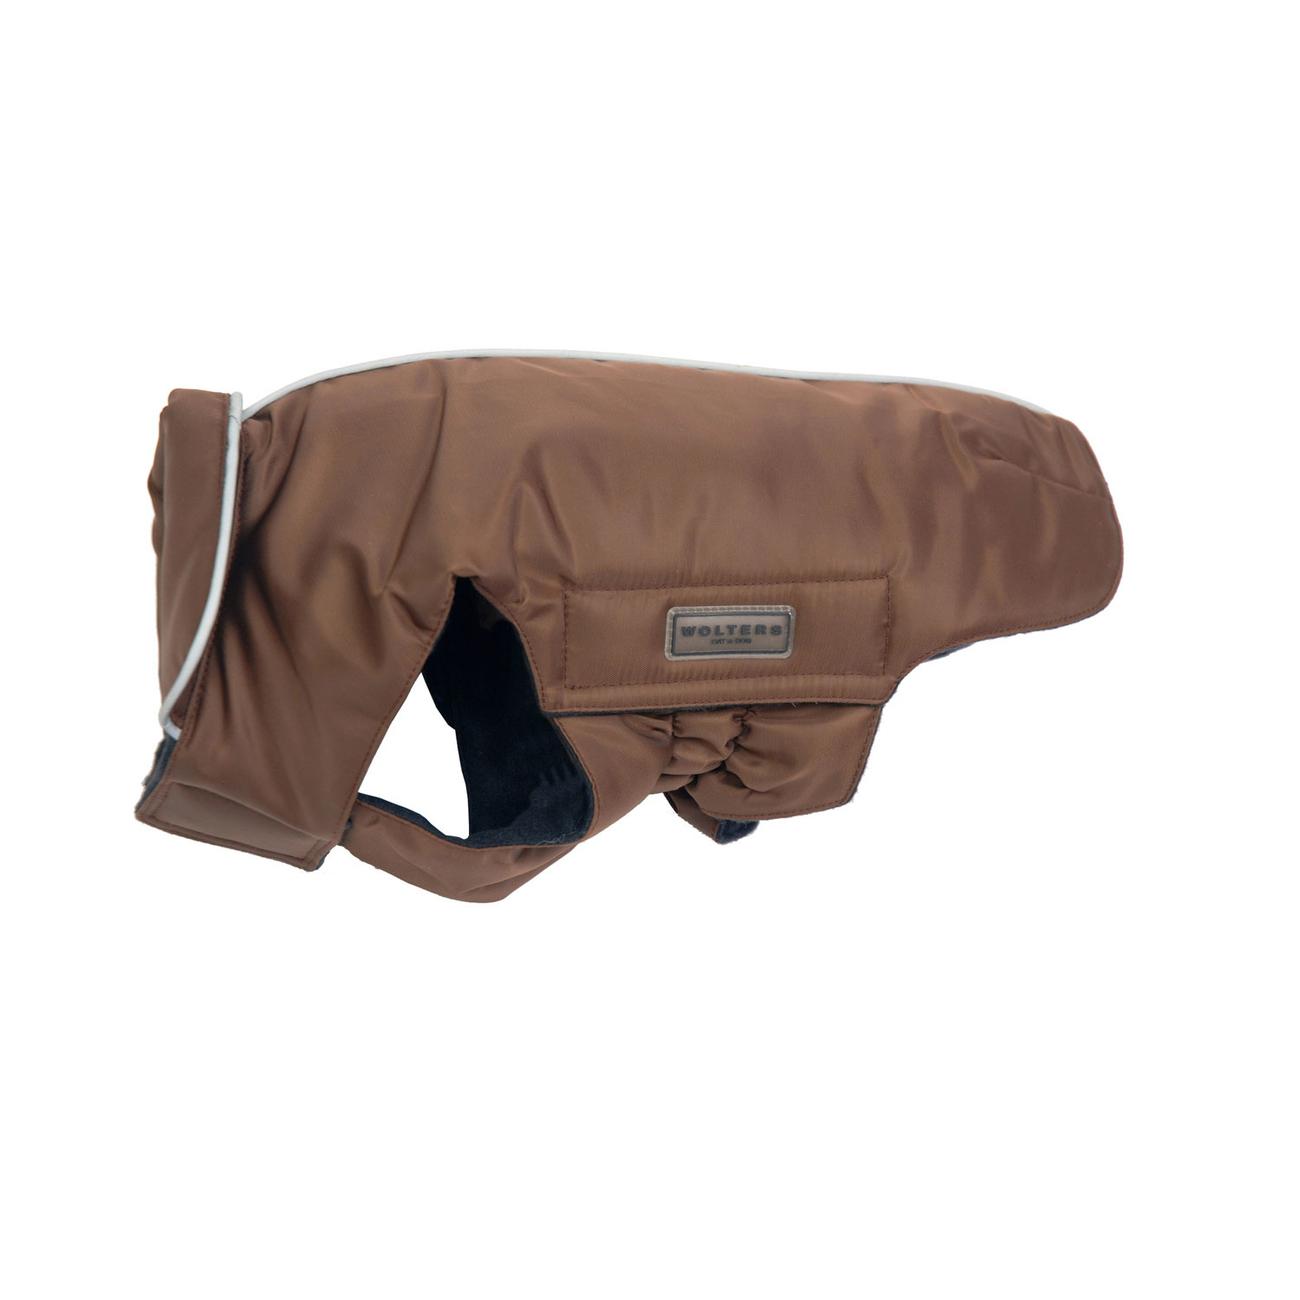 Wolters Hundemantel Outdoorjacke Jack für Mops & Co, Bild 2